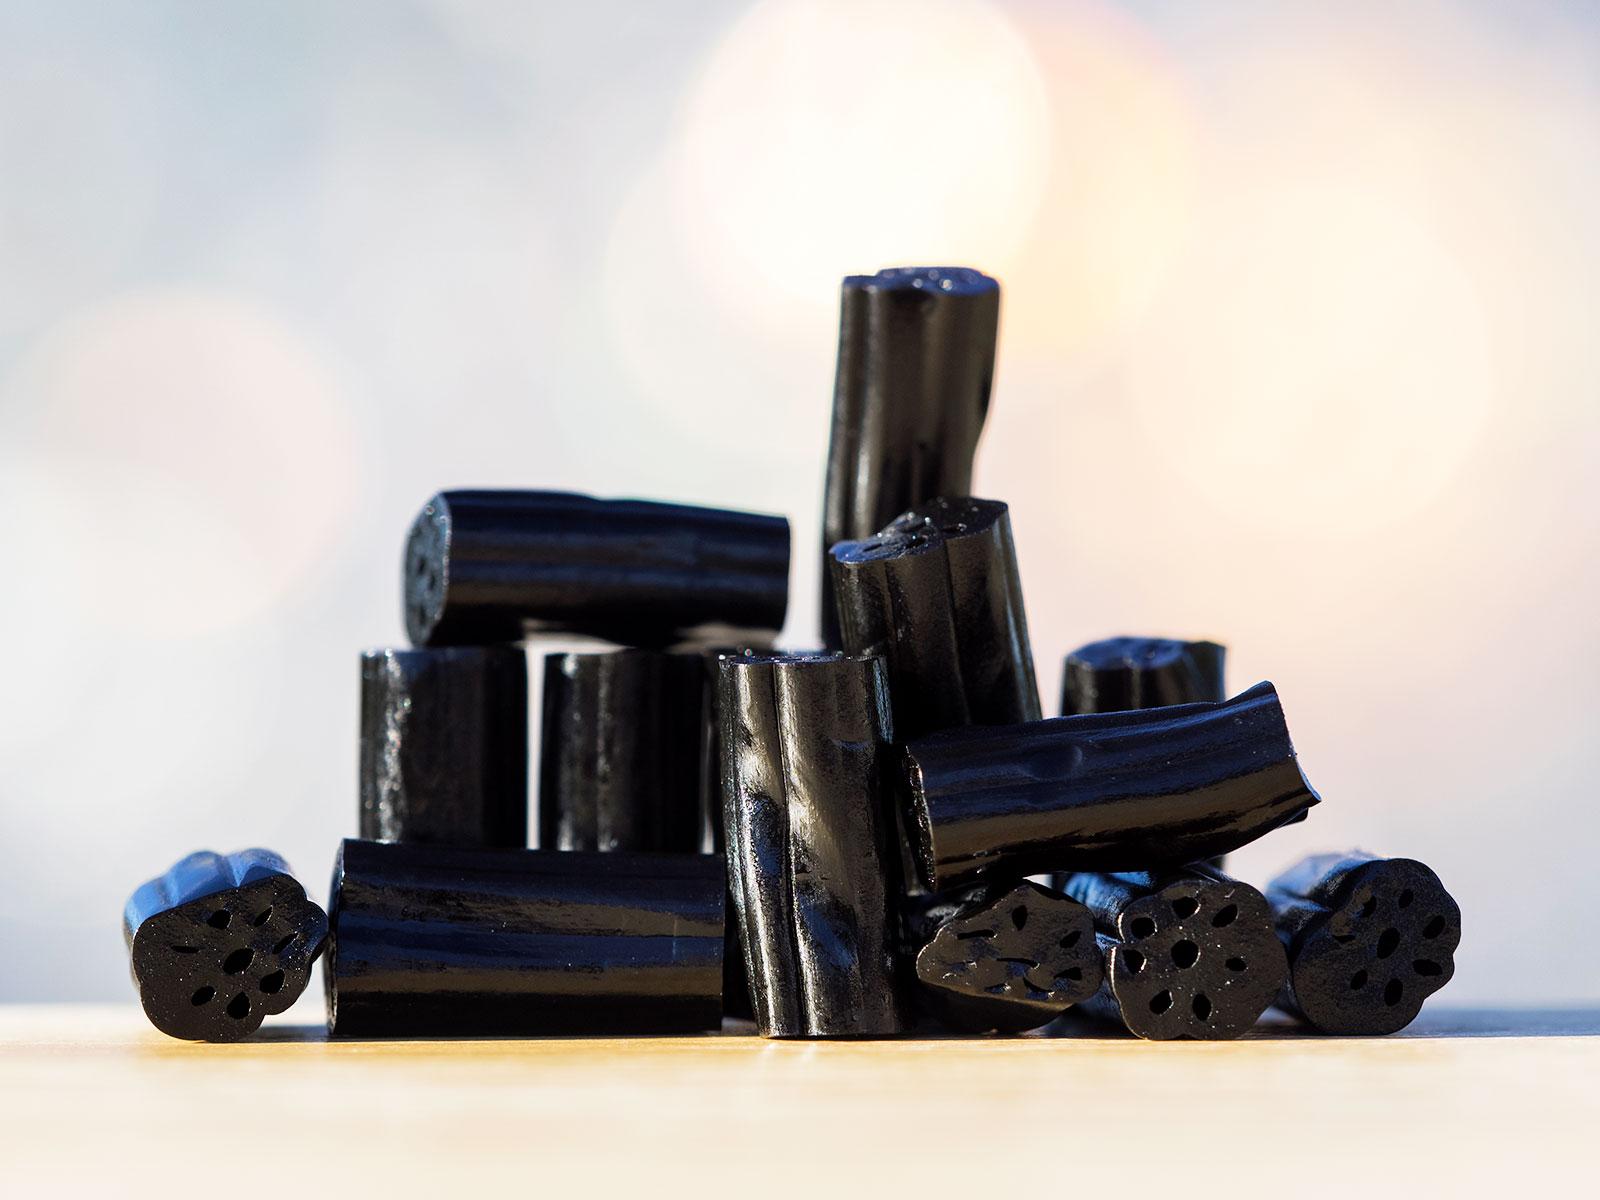 fda warns against black licorice overdose